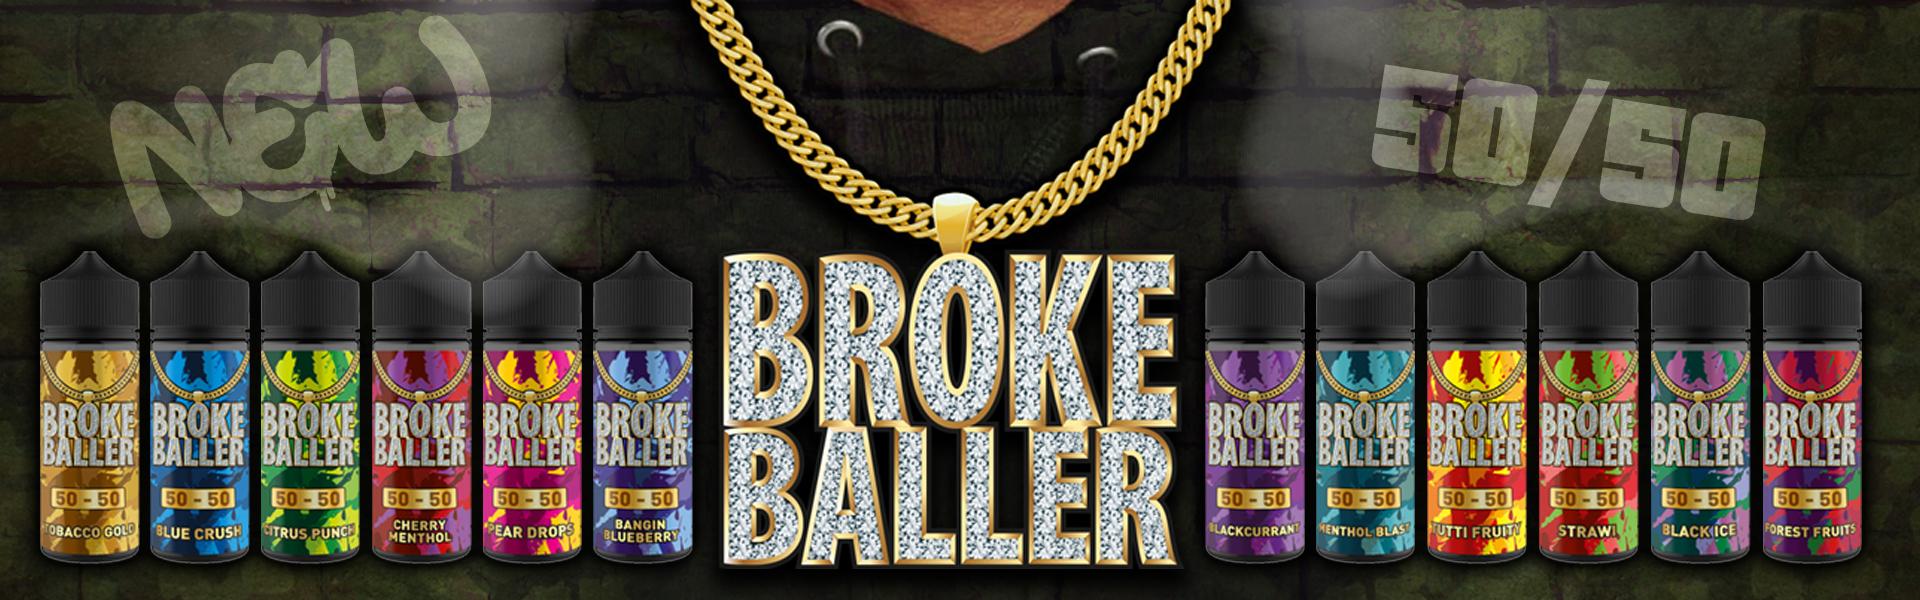 Broke Baller Liquid